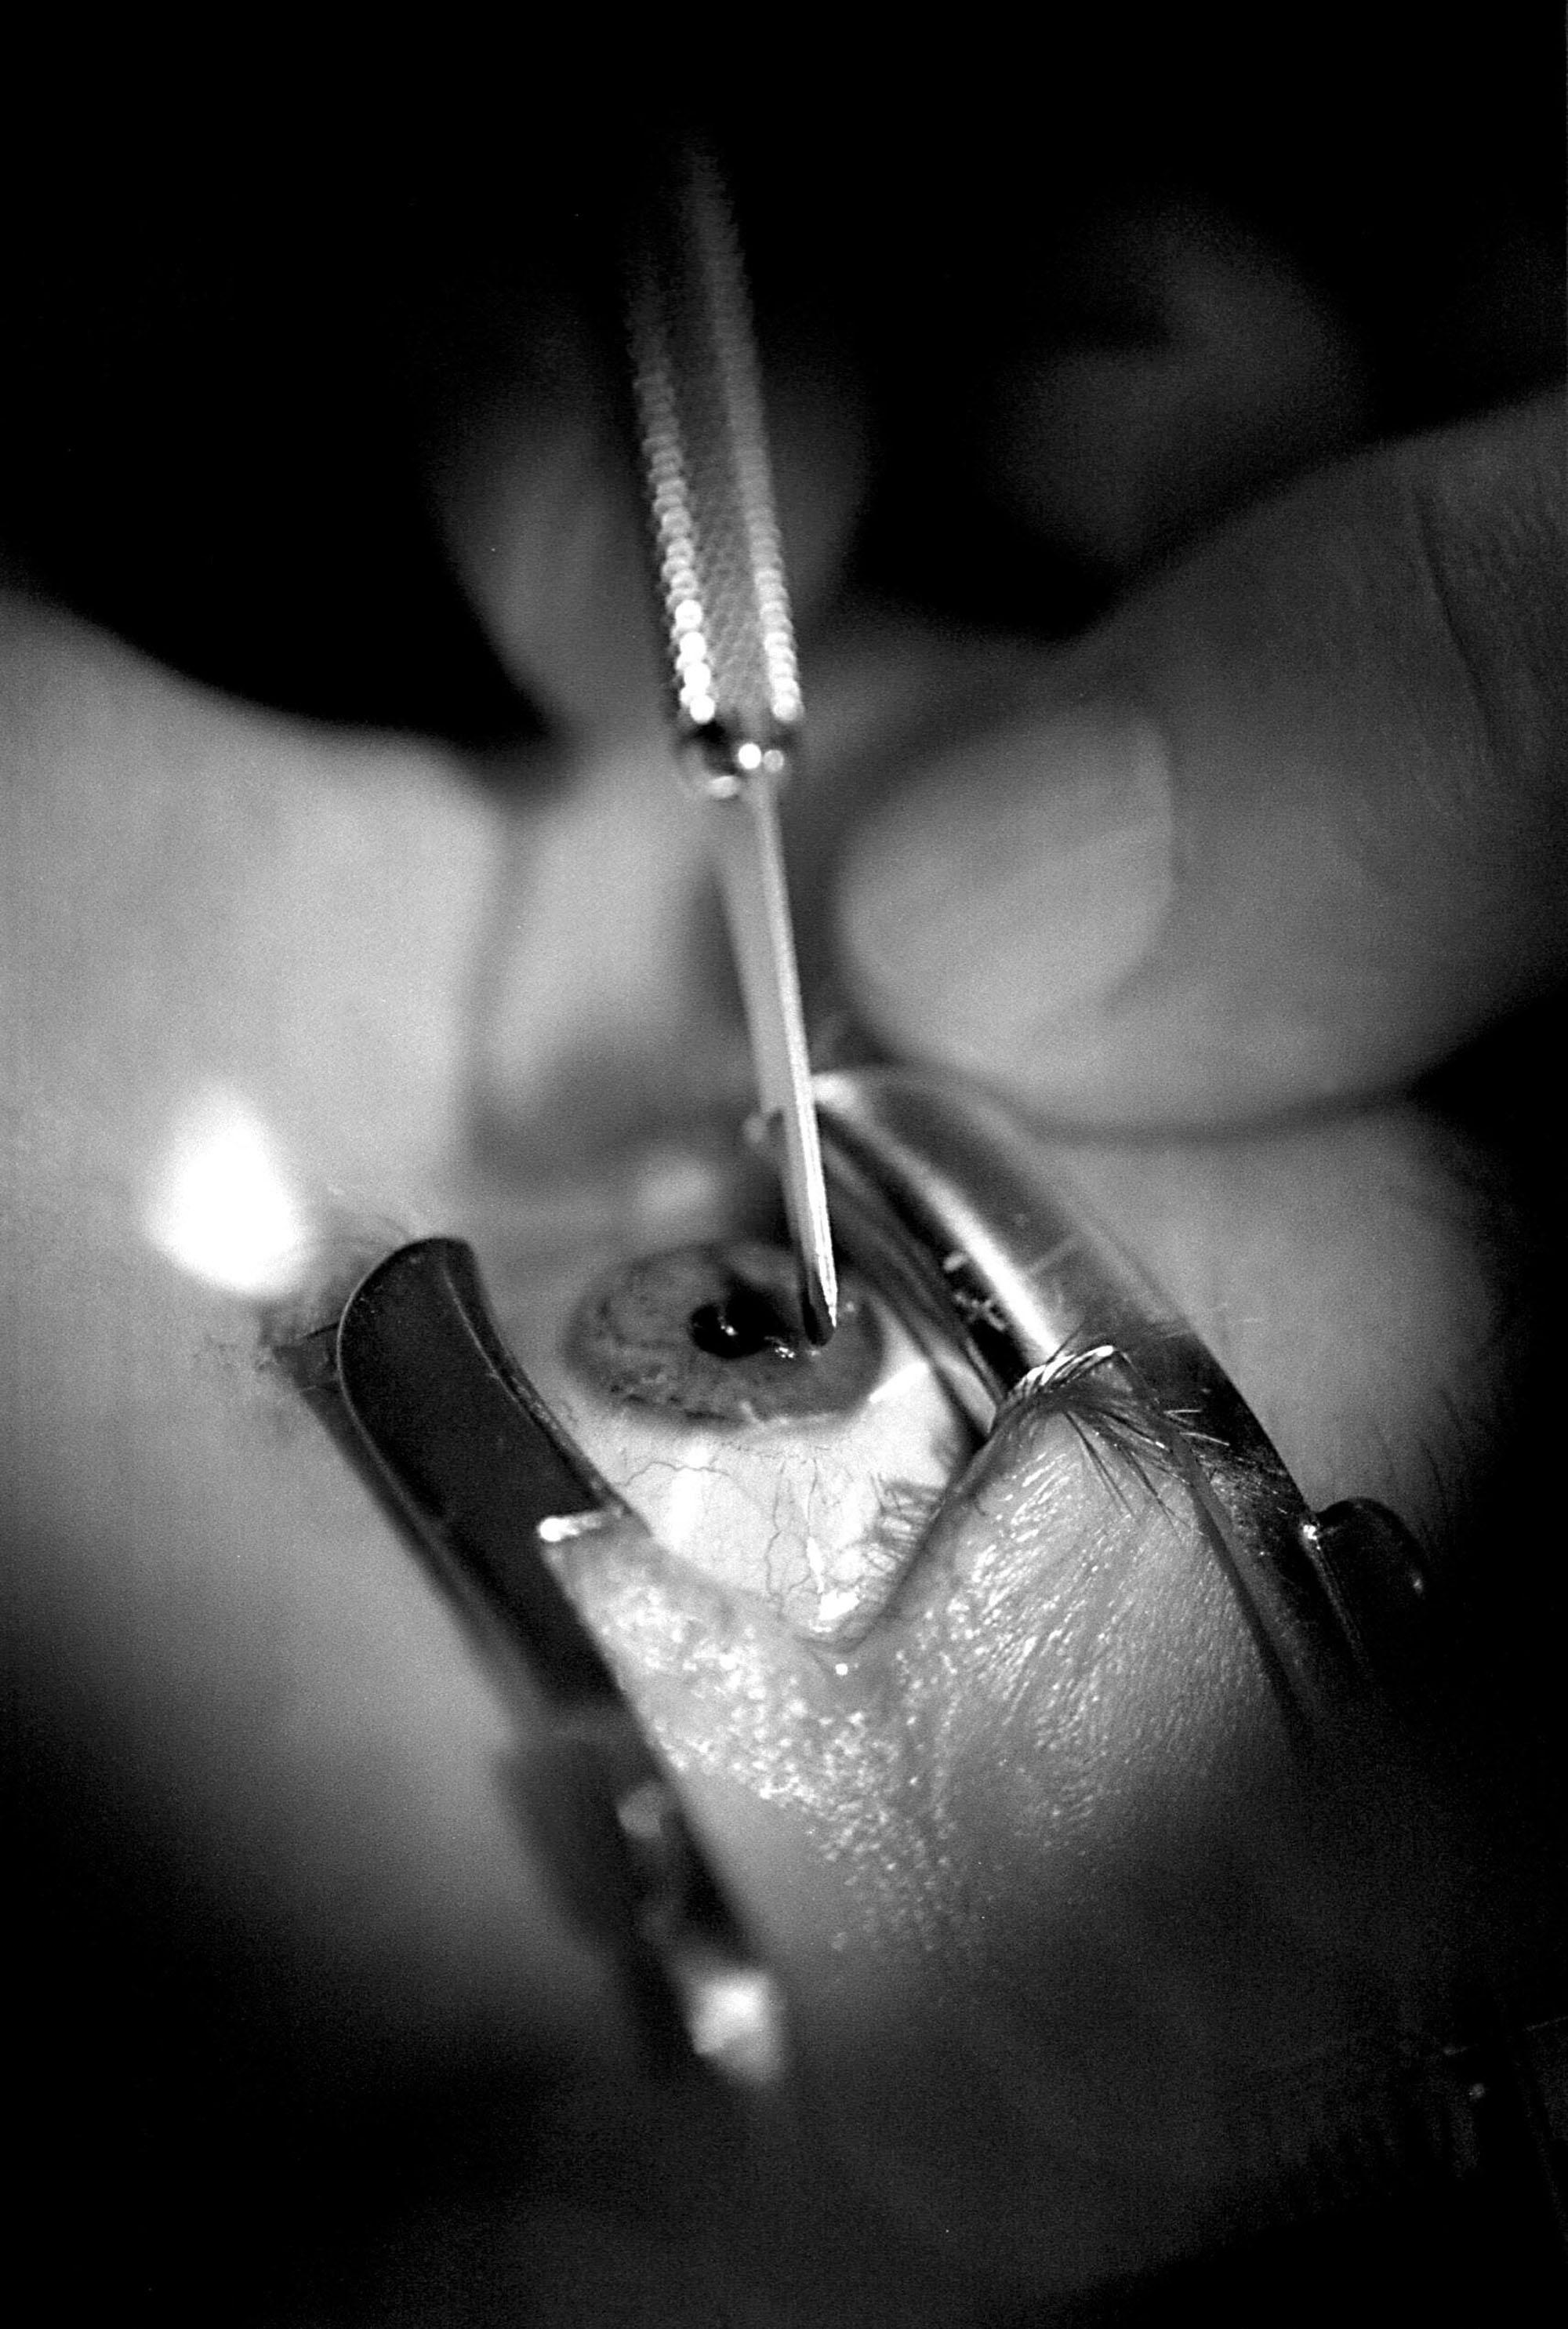 Eye Surgery shutterstock_2754277_2000.jpg